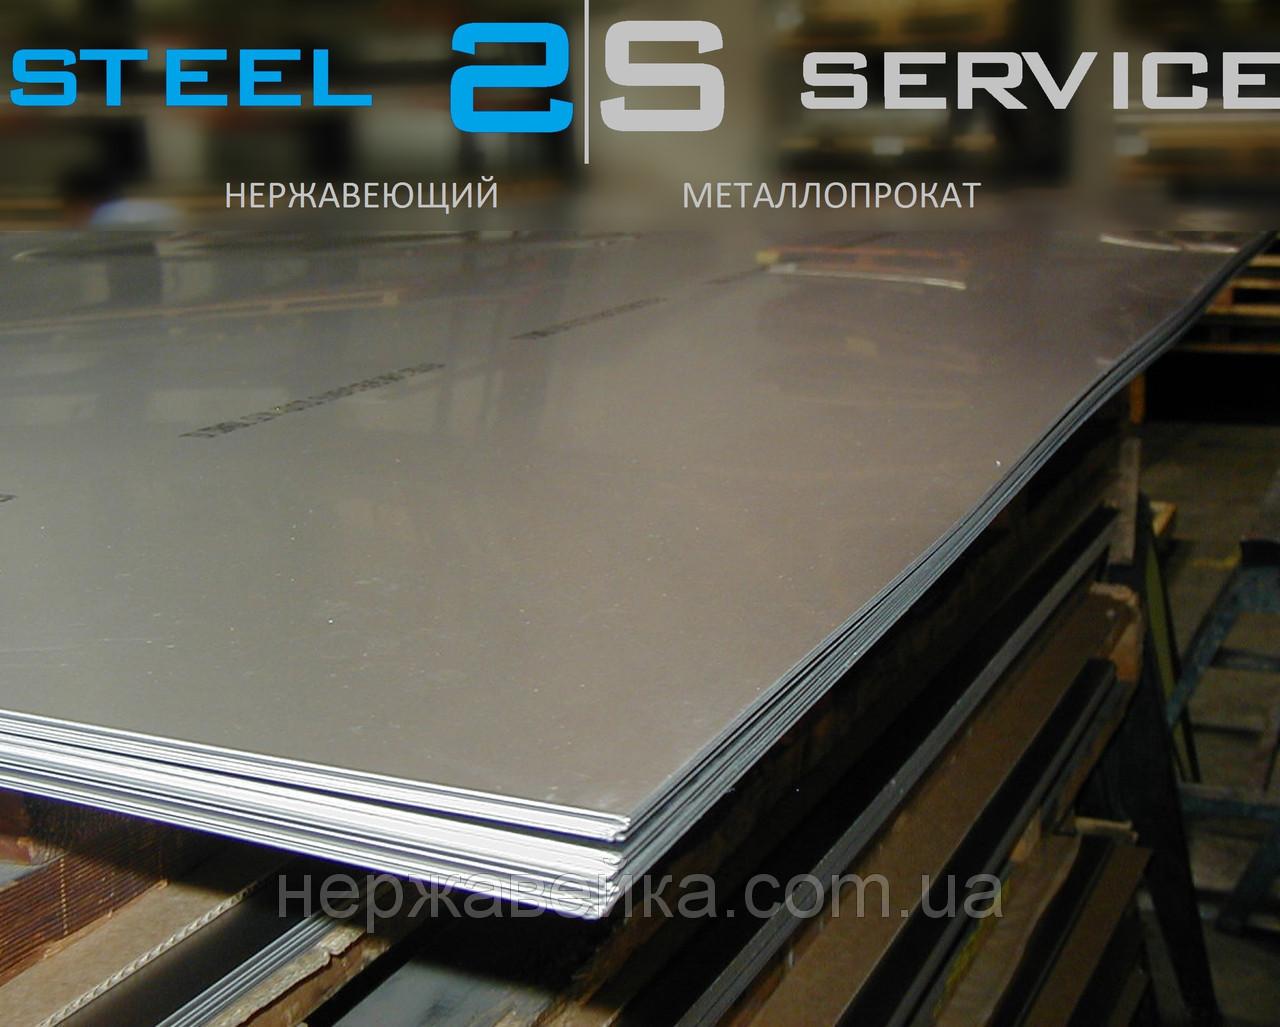 Нержавеющий лист 1,5х1250х2500мм AiSi 201  (12Х15Г9НД) - 2B - матовый